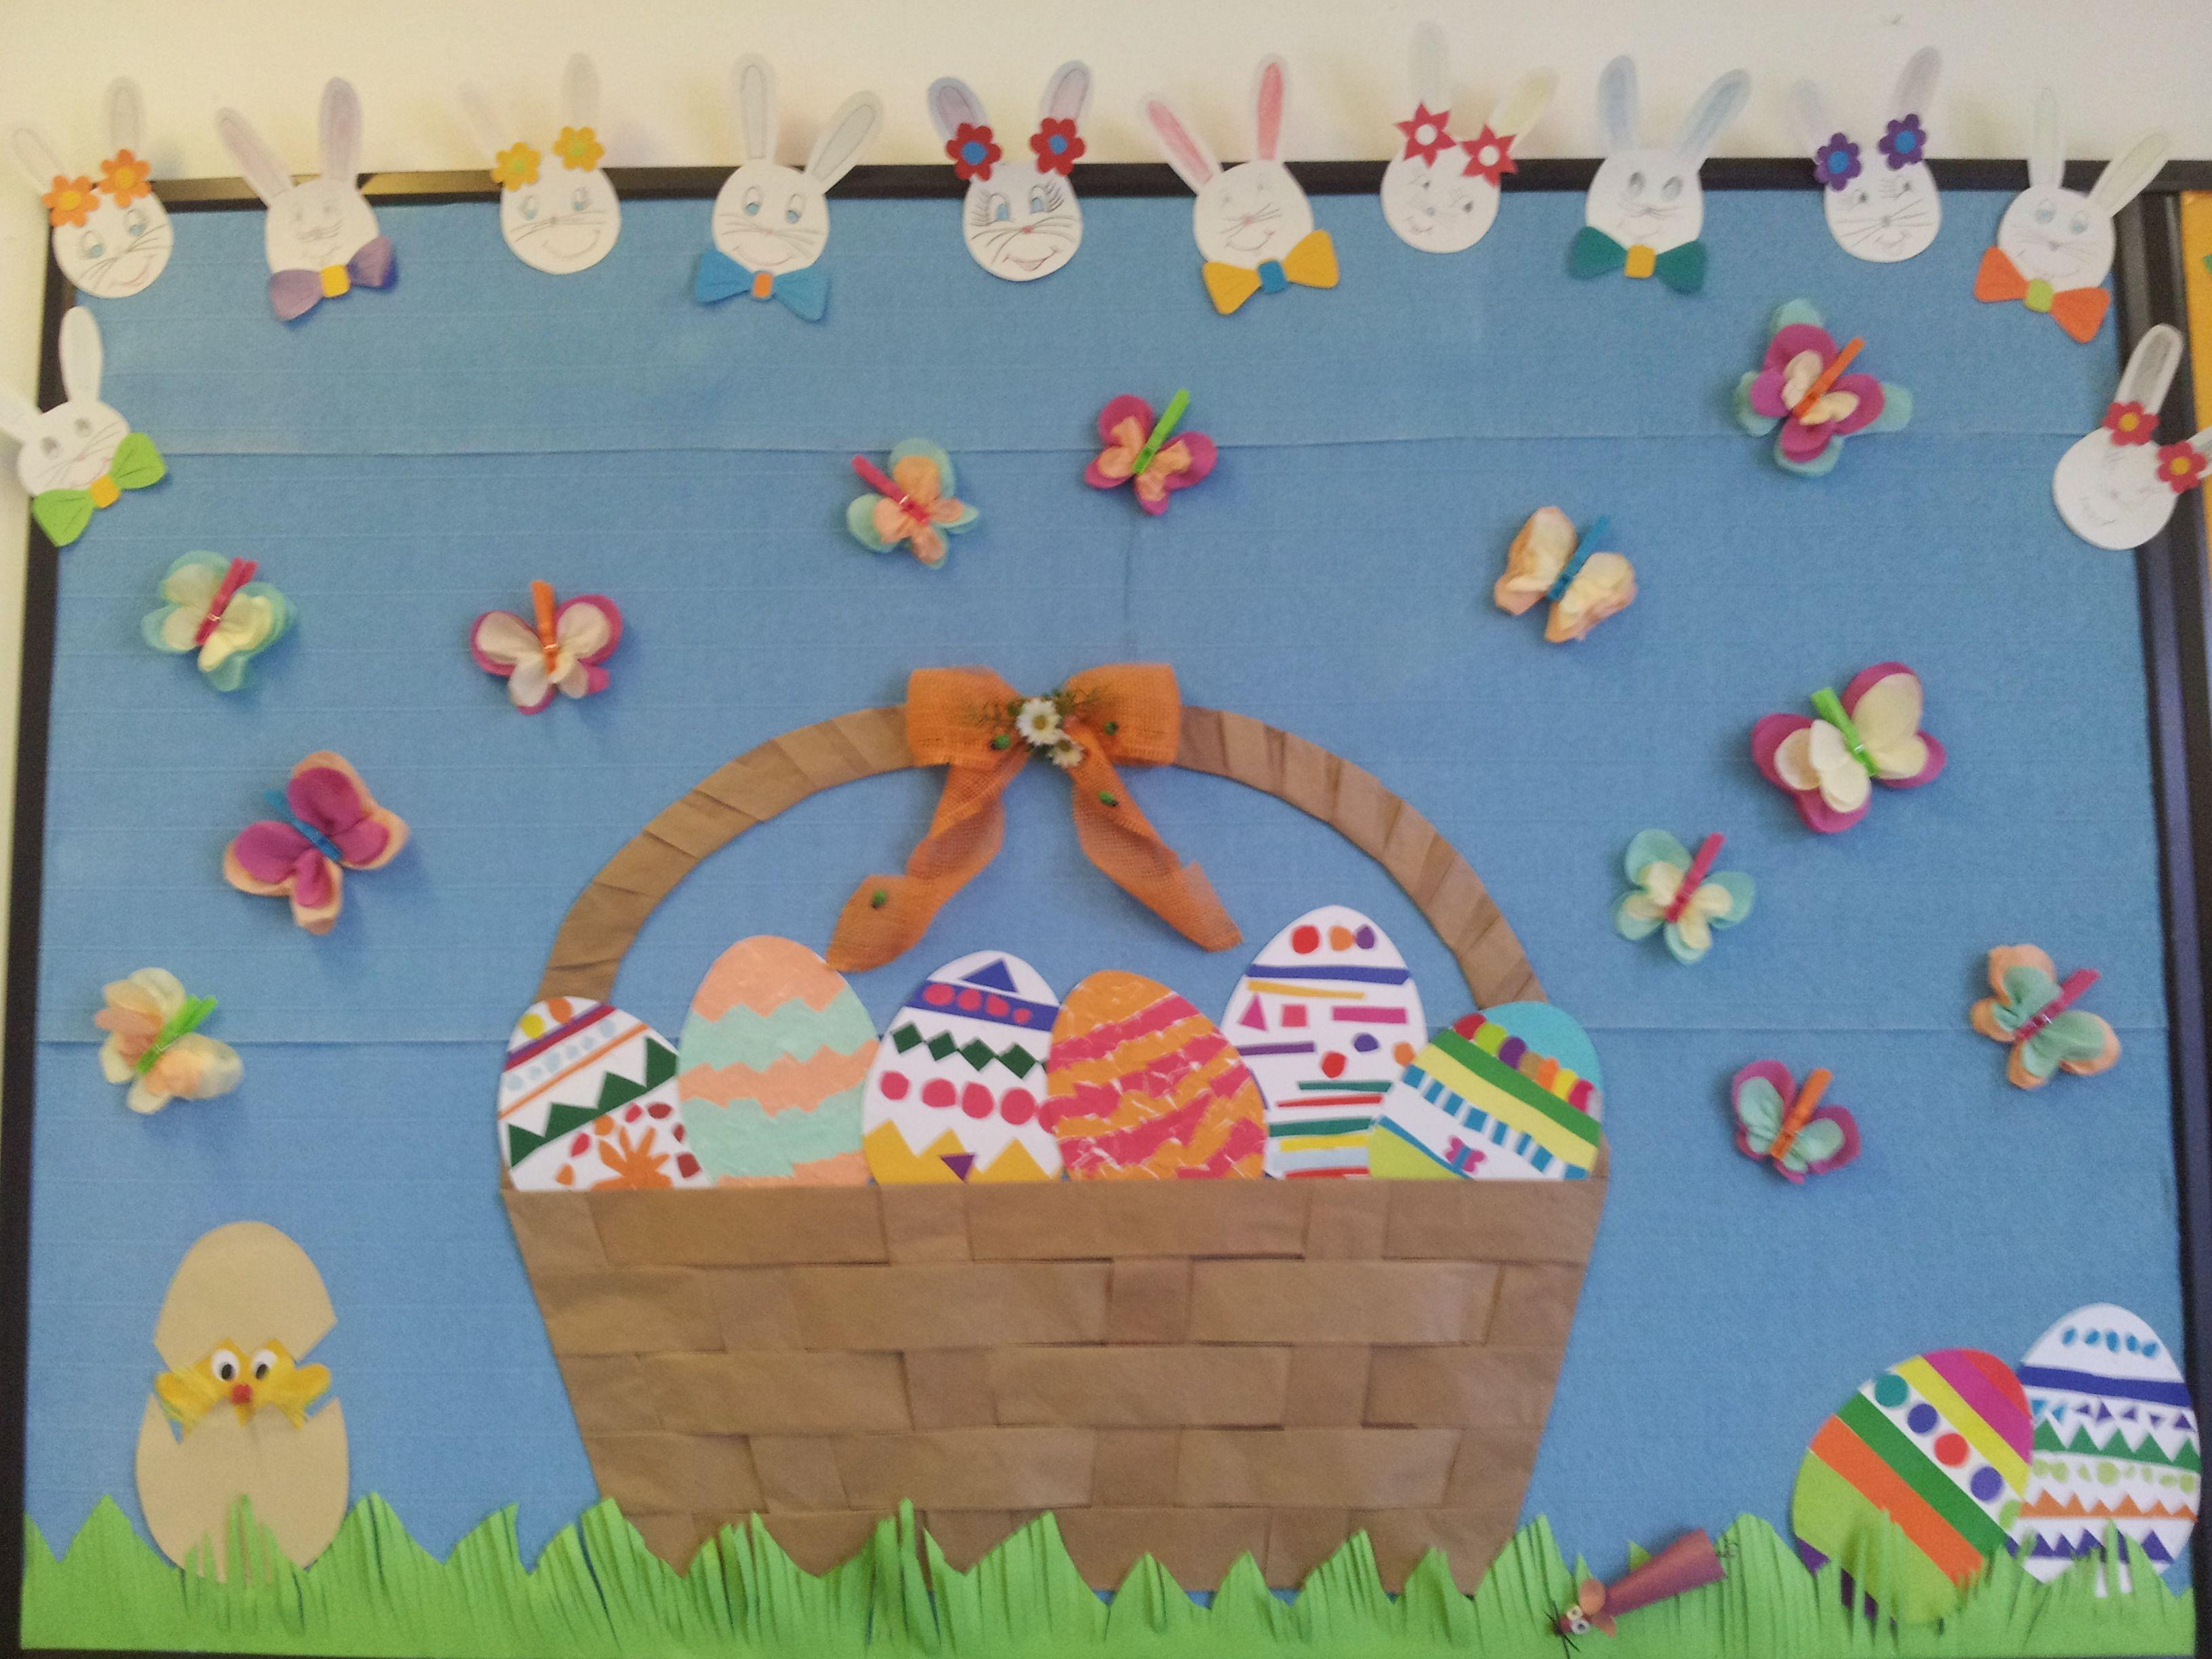 Classroom Theme Basket Ideas ~ Easter bulletin board idea my school crafts pinterest